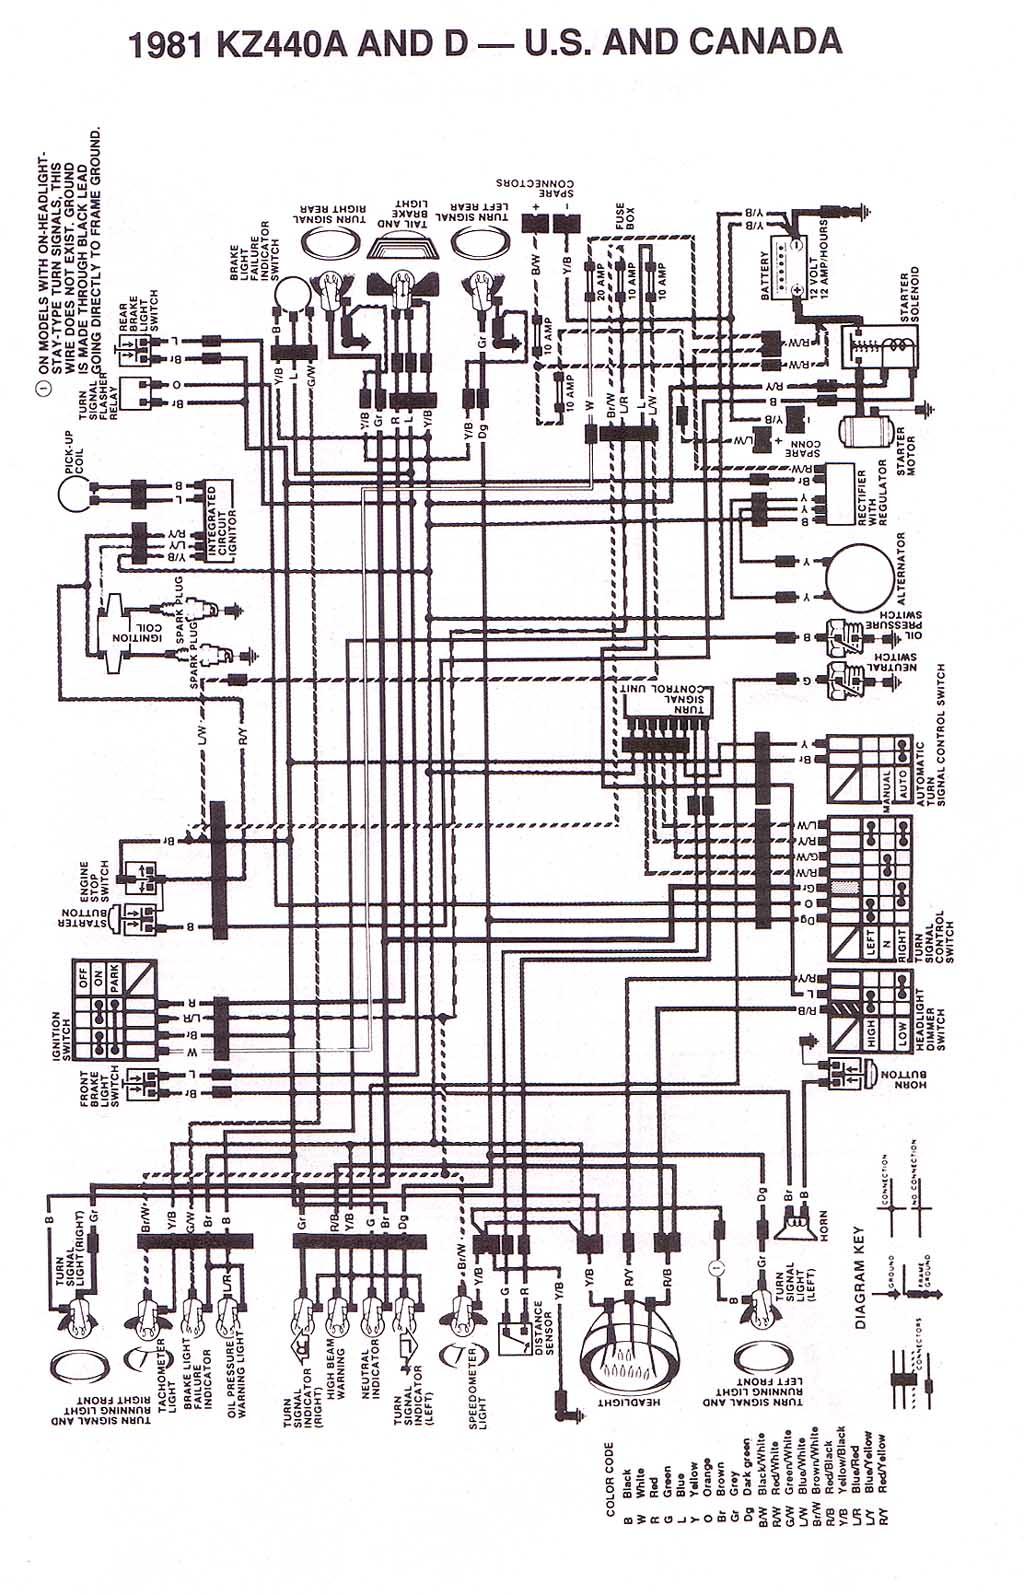 Bayou 250 Wiring Diagram Battery. Klf 300 Wiring Diagram, Kawasaki ...